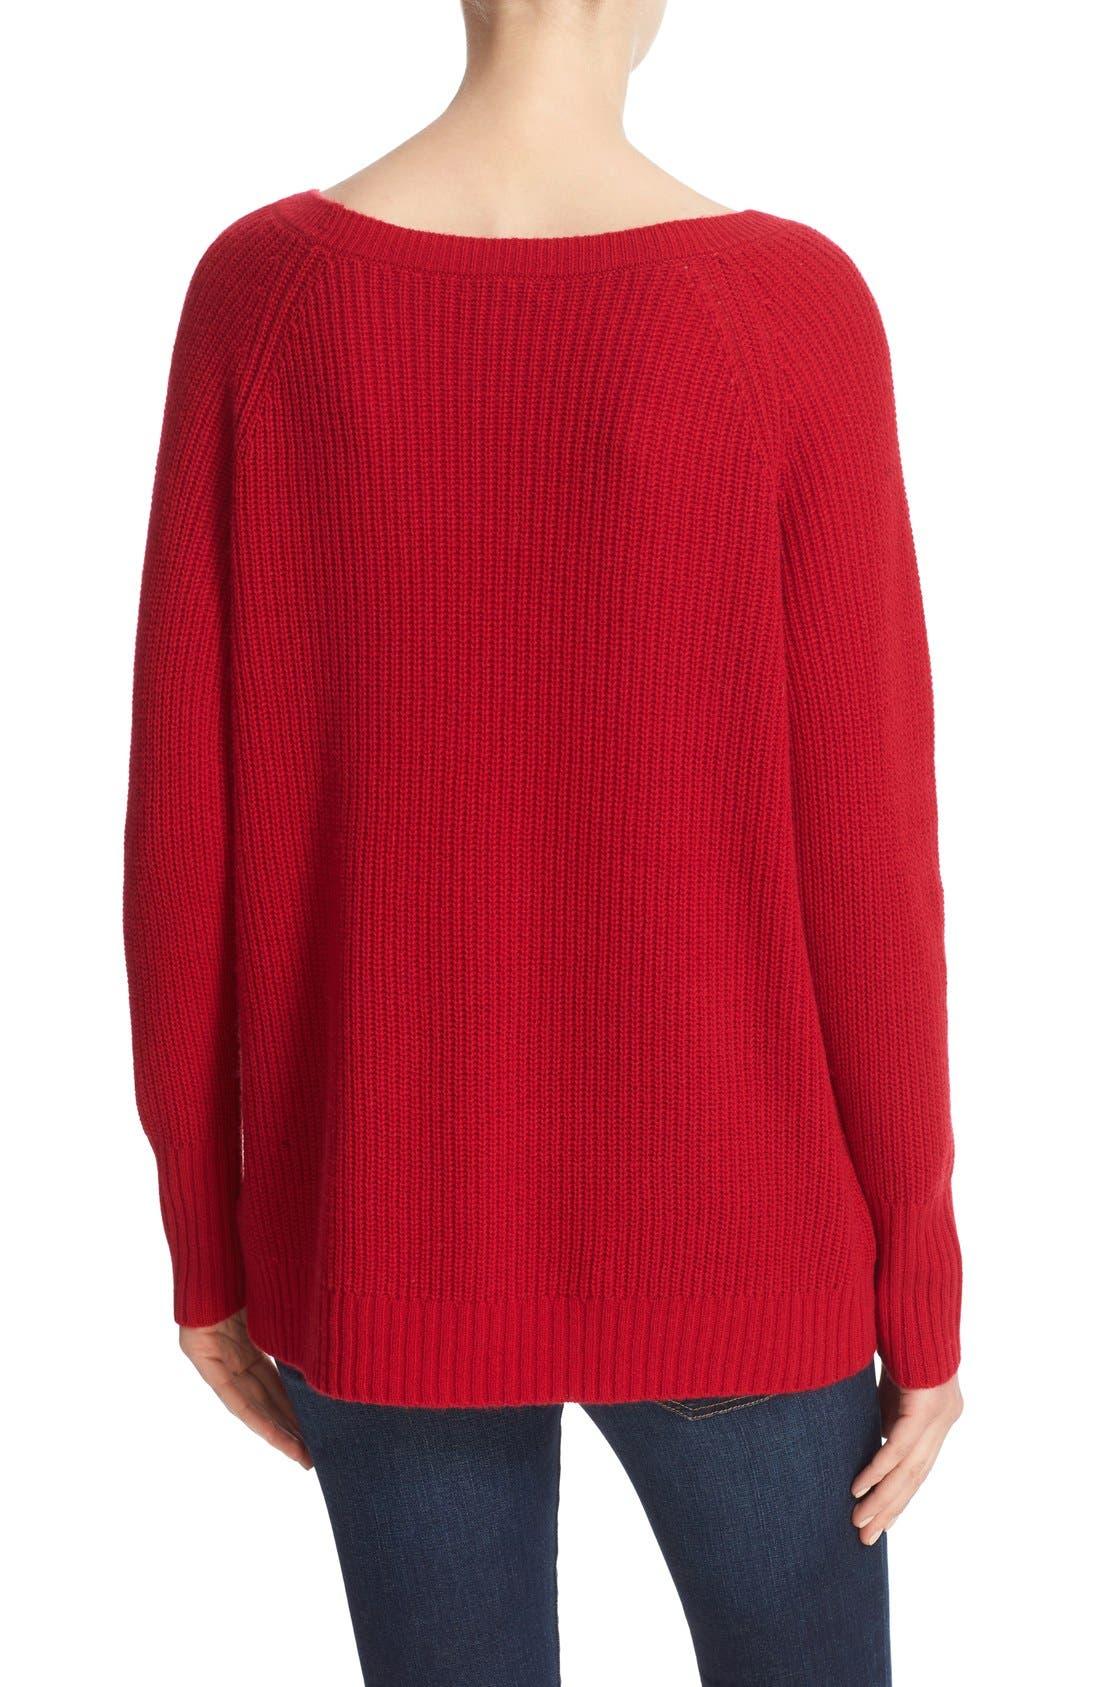 Ekin Wool & Cashmere Sweater,                             Alternate thumbnail 2, color,                             Ruby